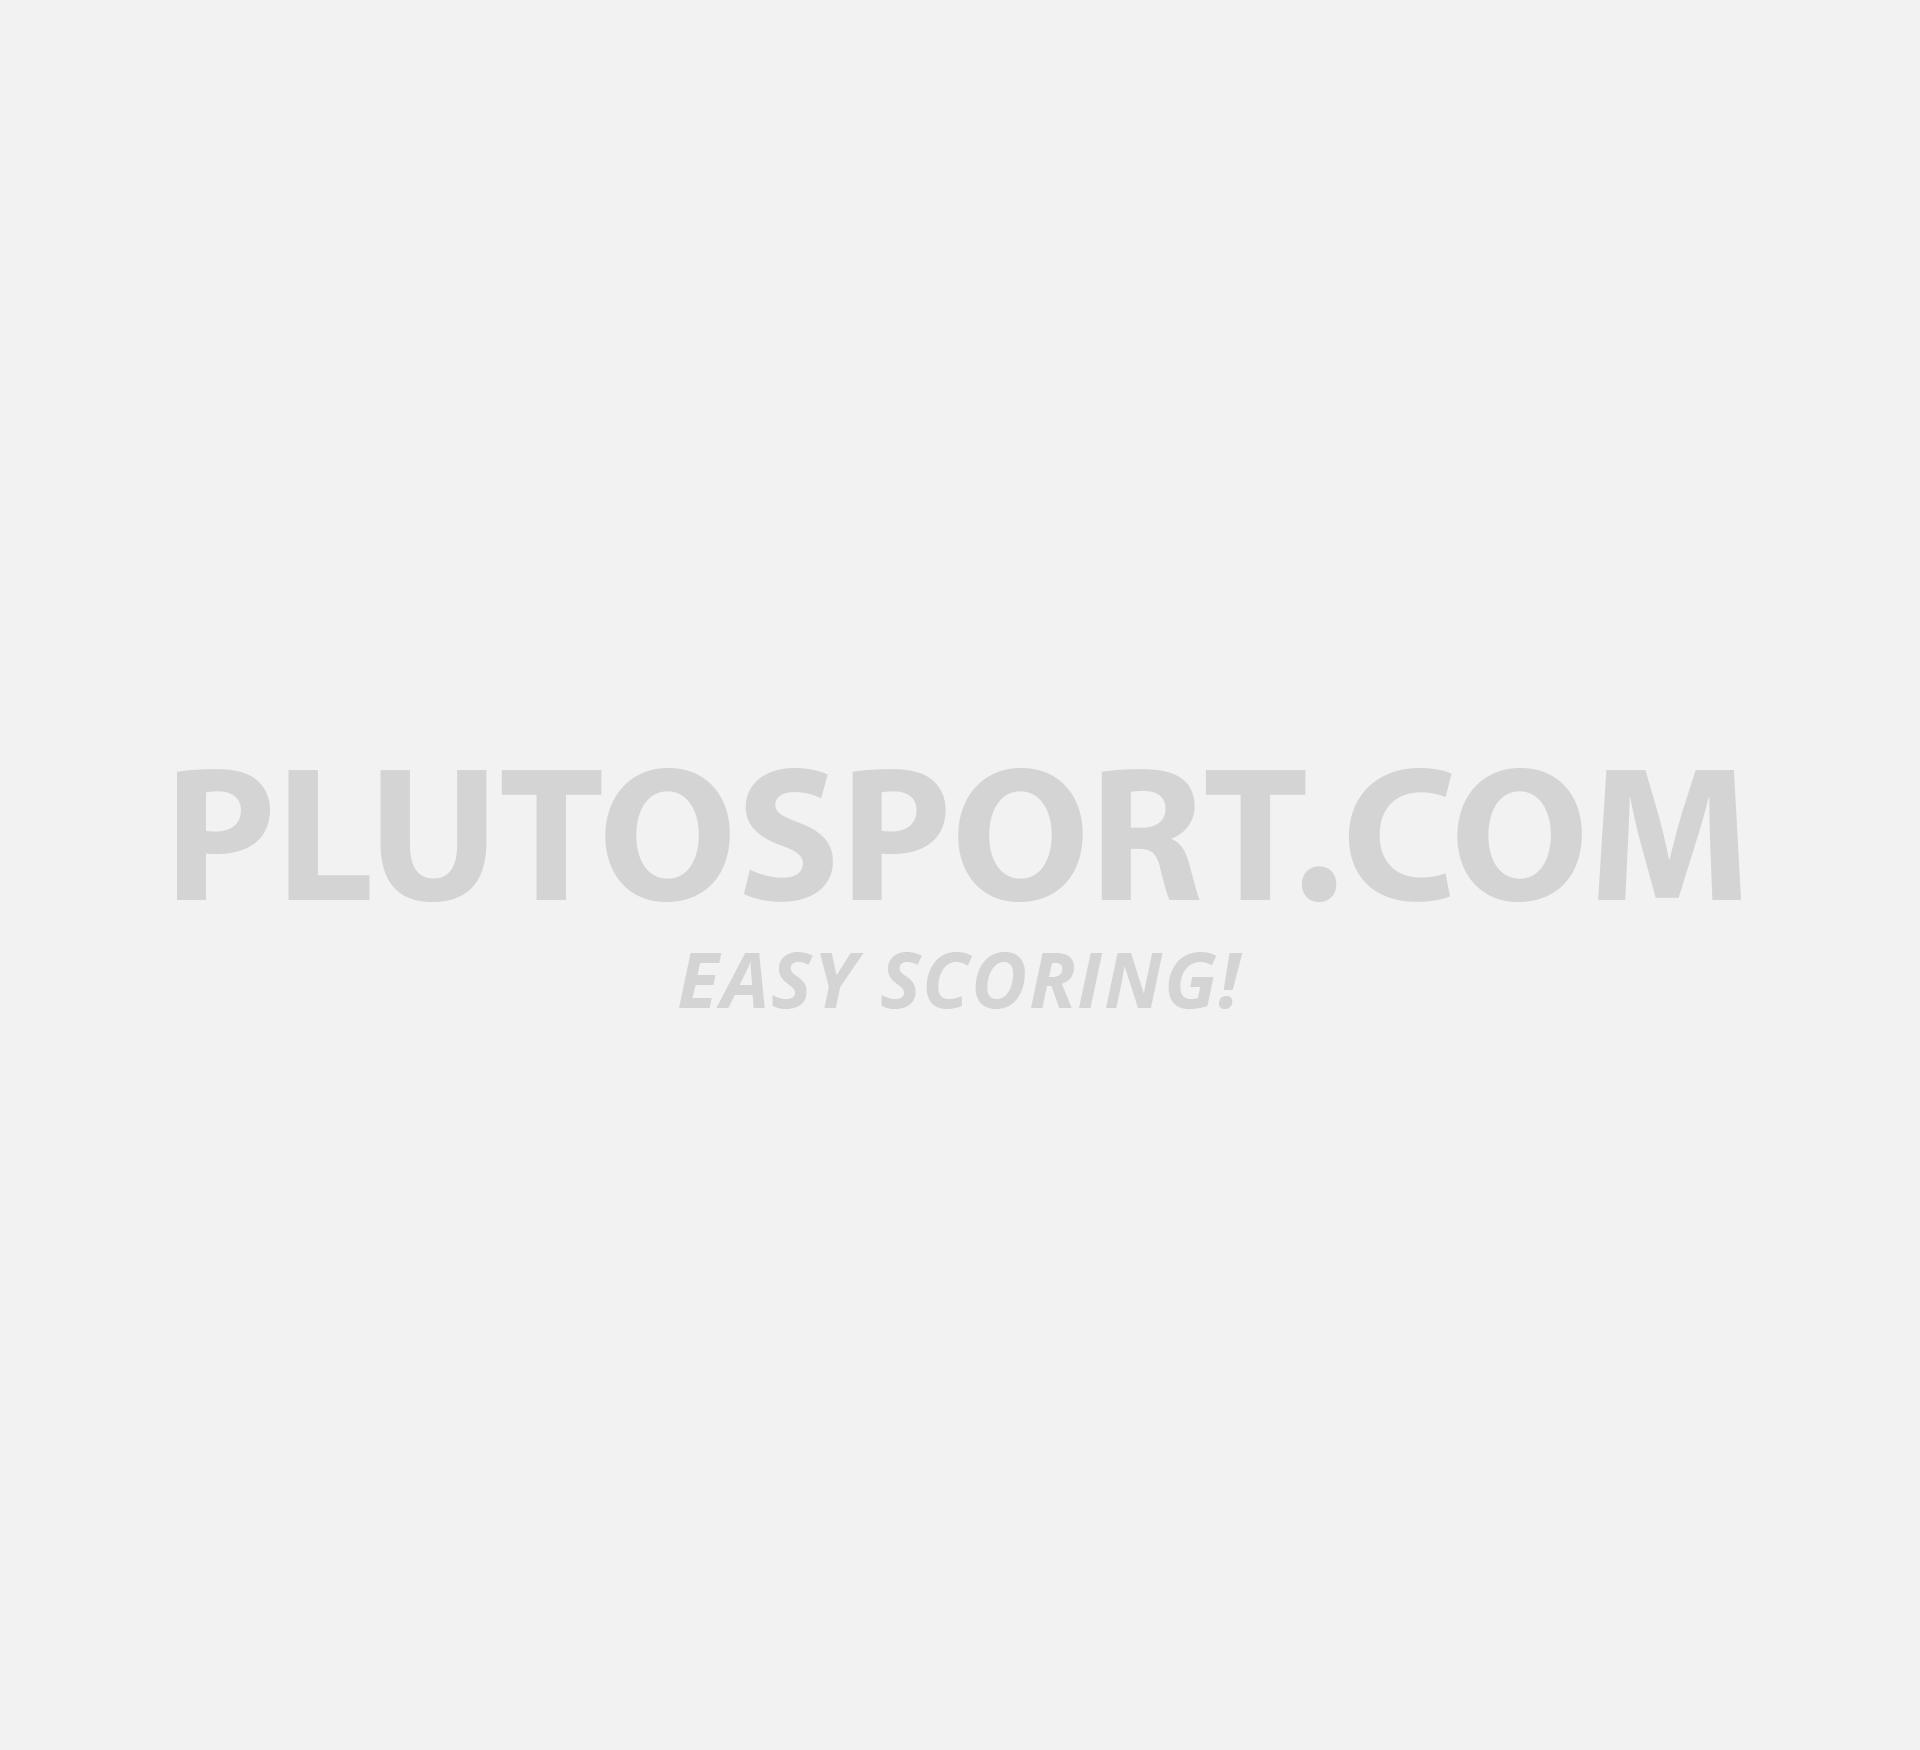 8c541e1efd0 Puma Vikky Platform Ribbon - Sneakers - Shoes - Lifestyle - Sports |  Plutosport